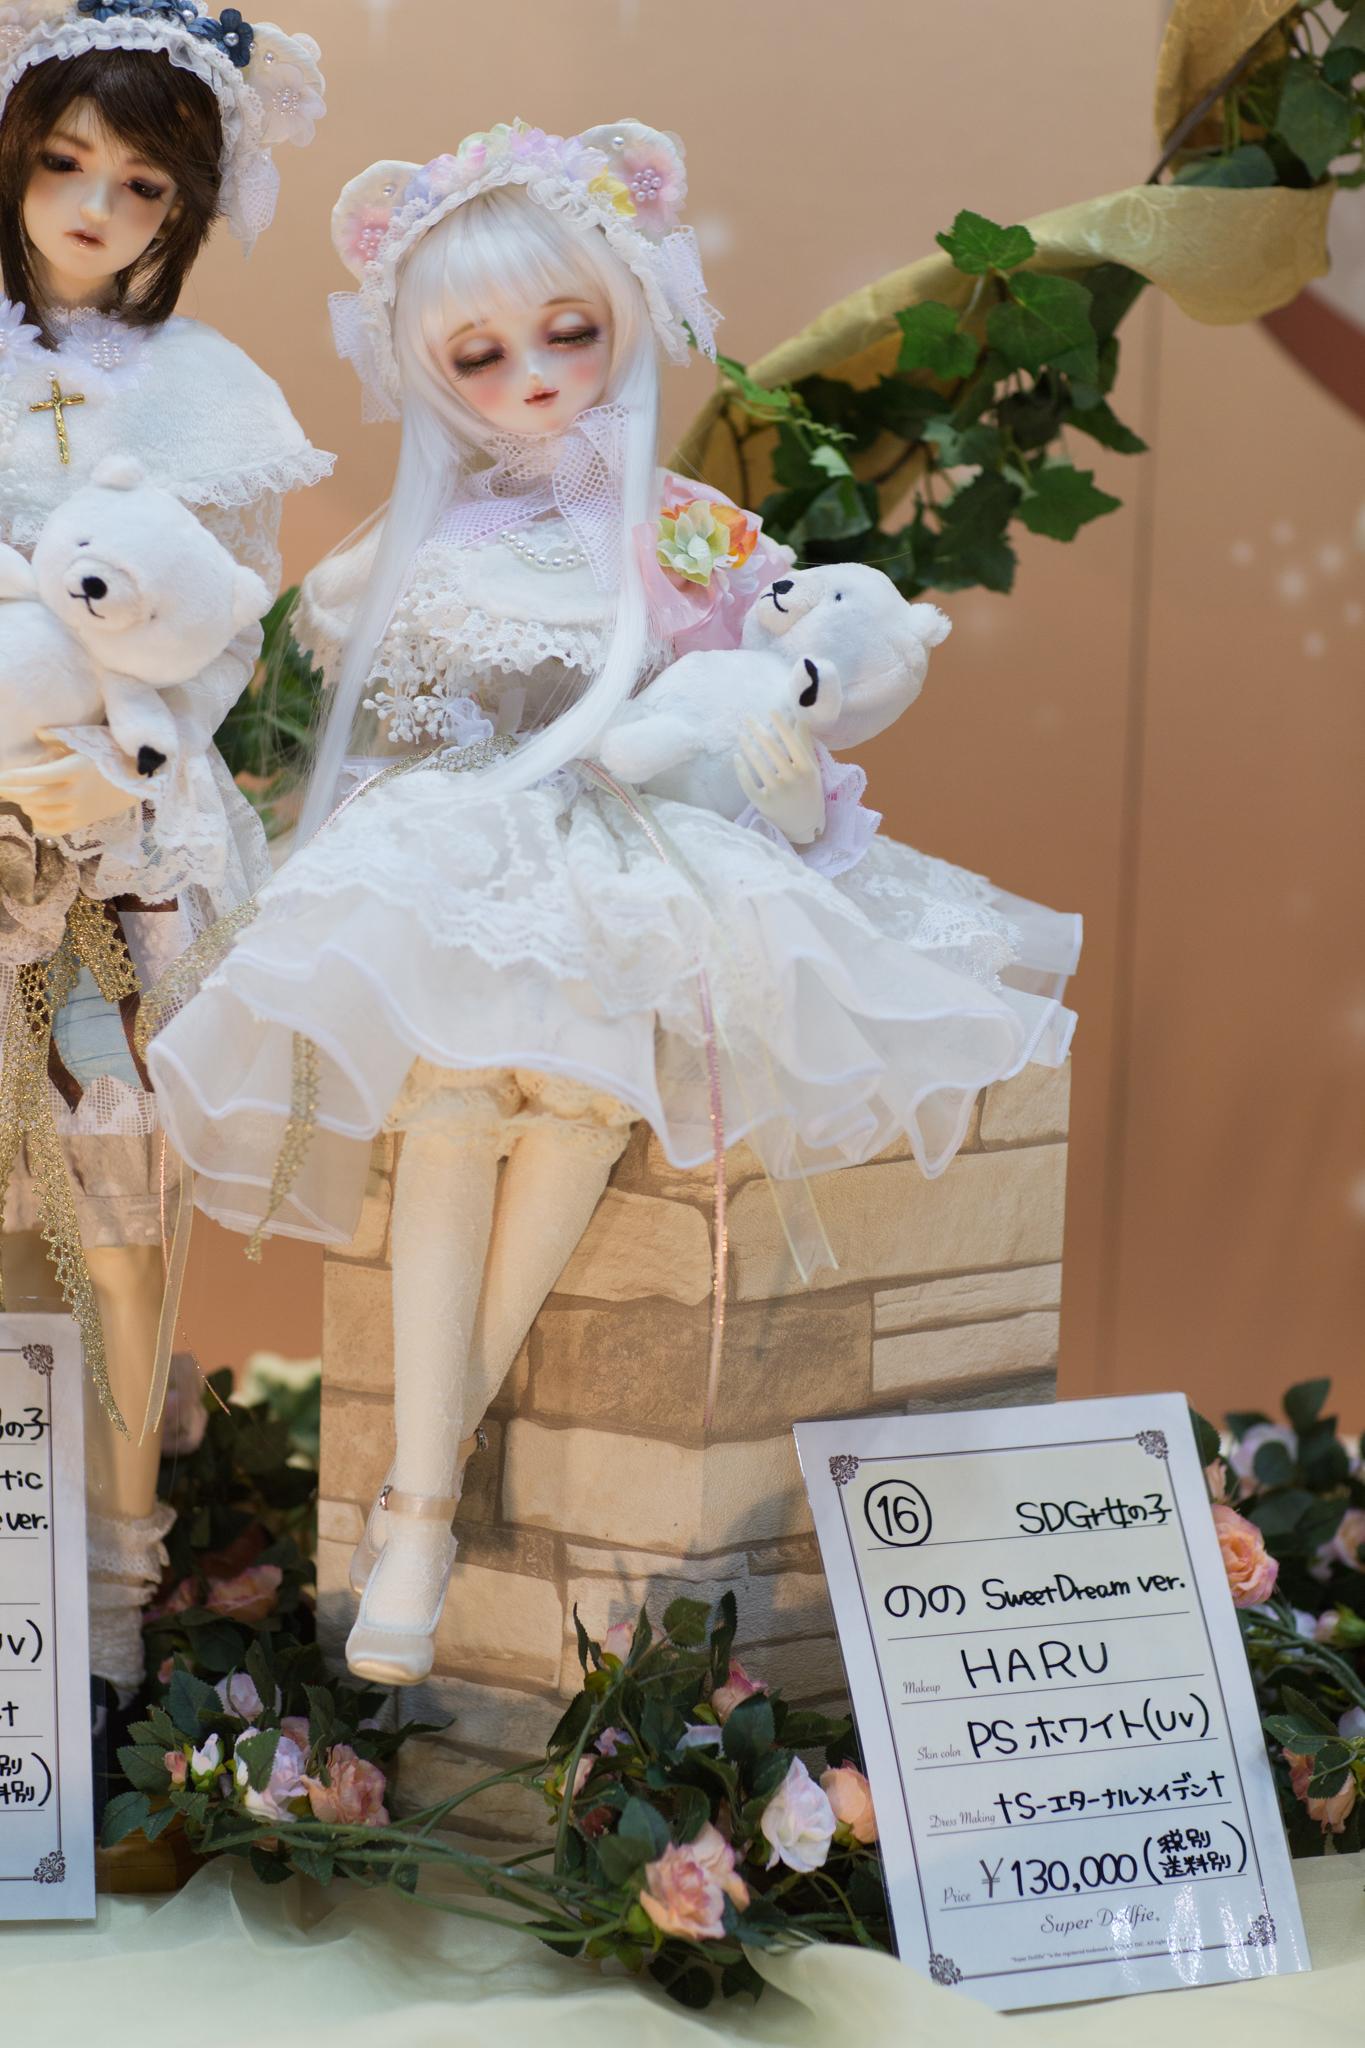 SDGr女の子 のの Sweet Dream Ver.